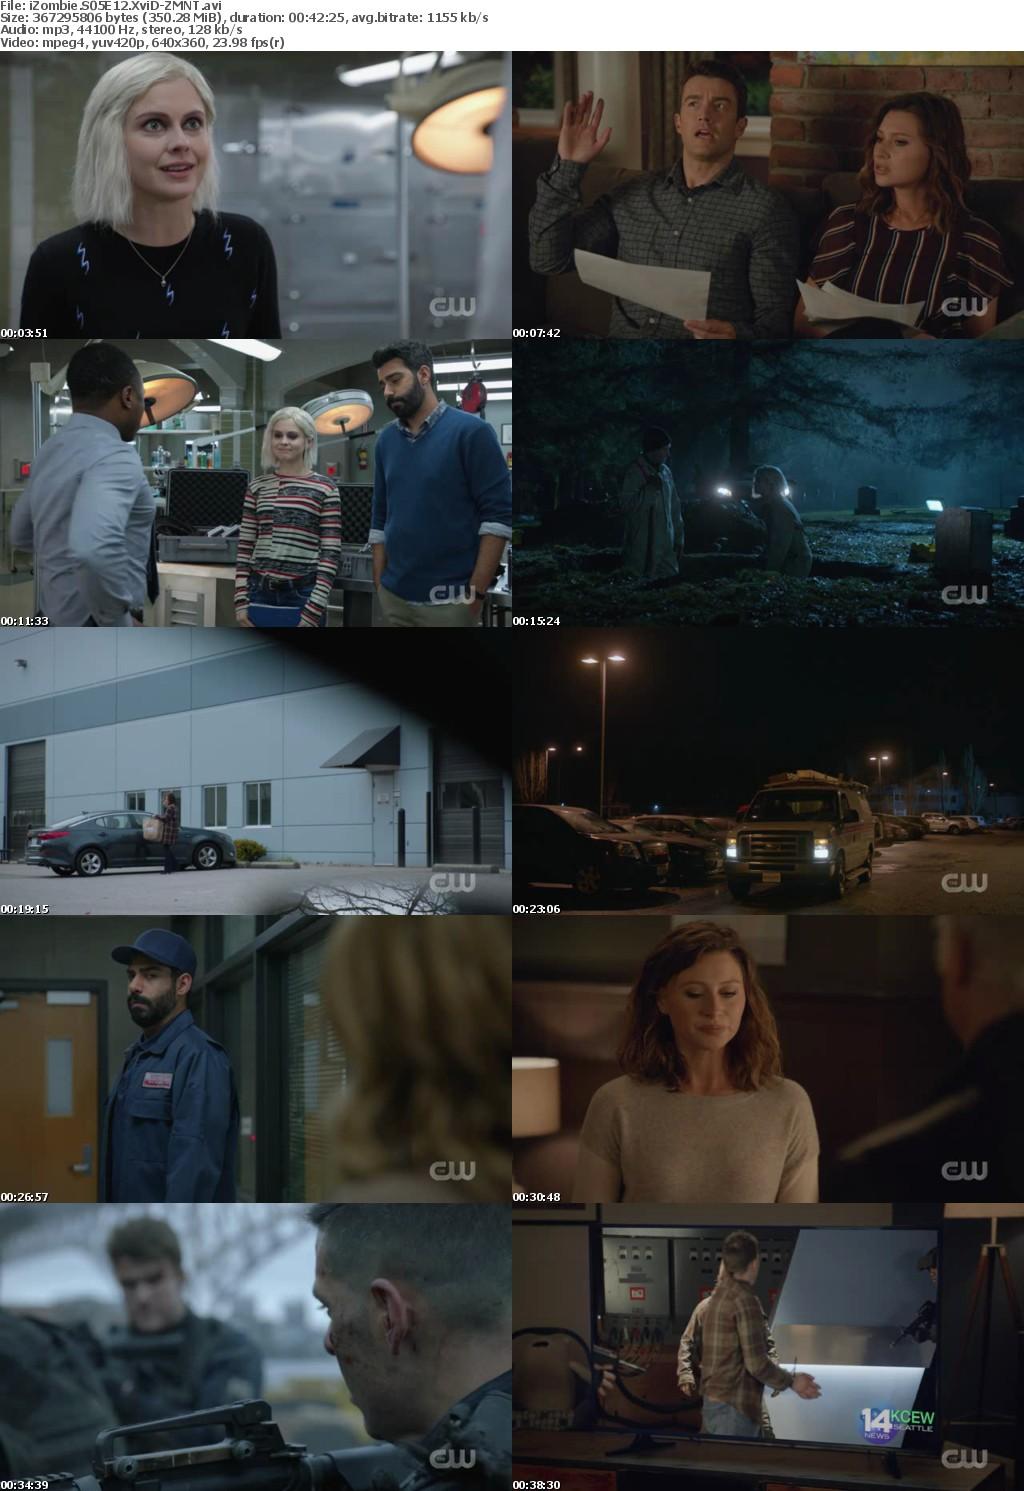 iZombie S05E12 XviD-ZMNT